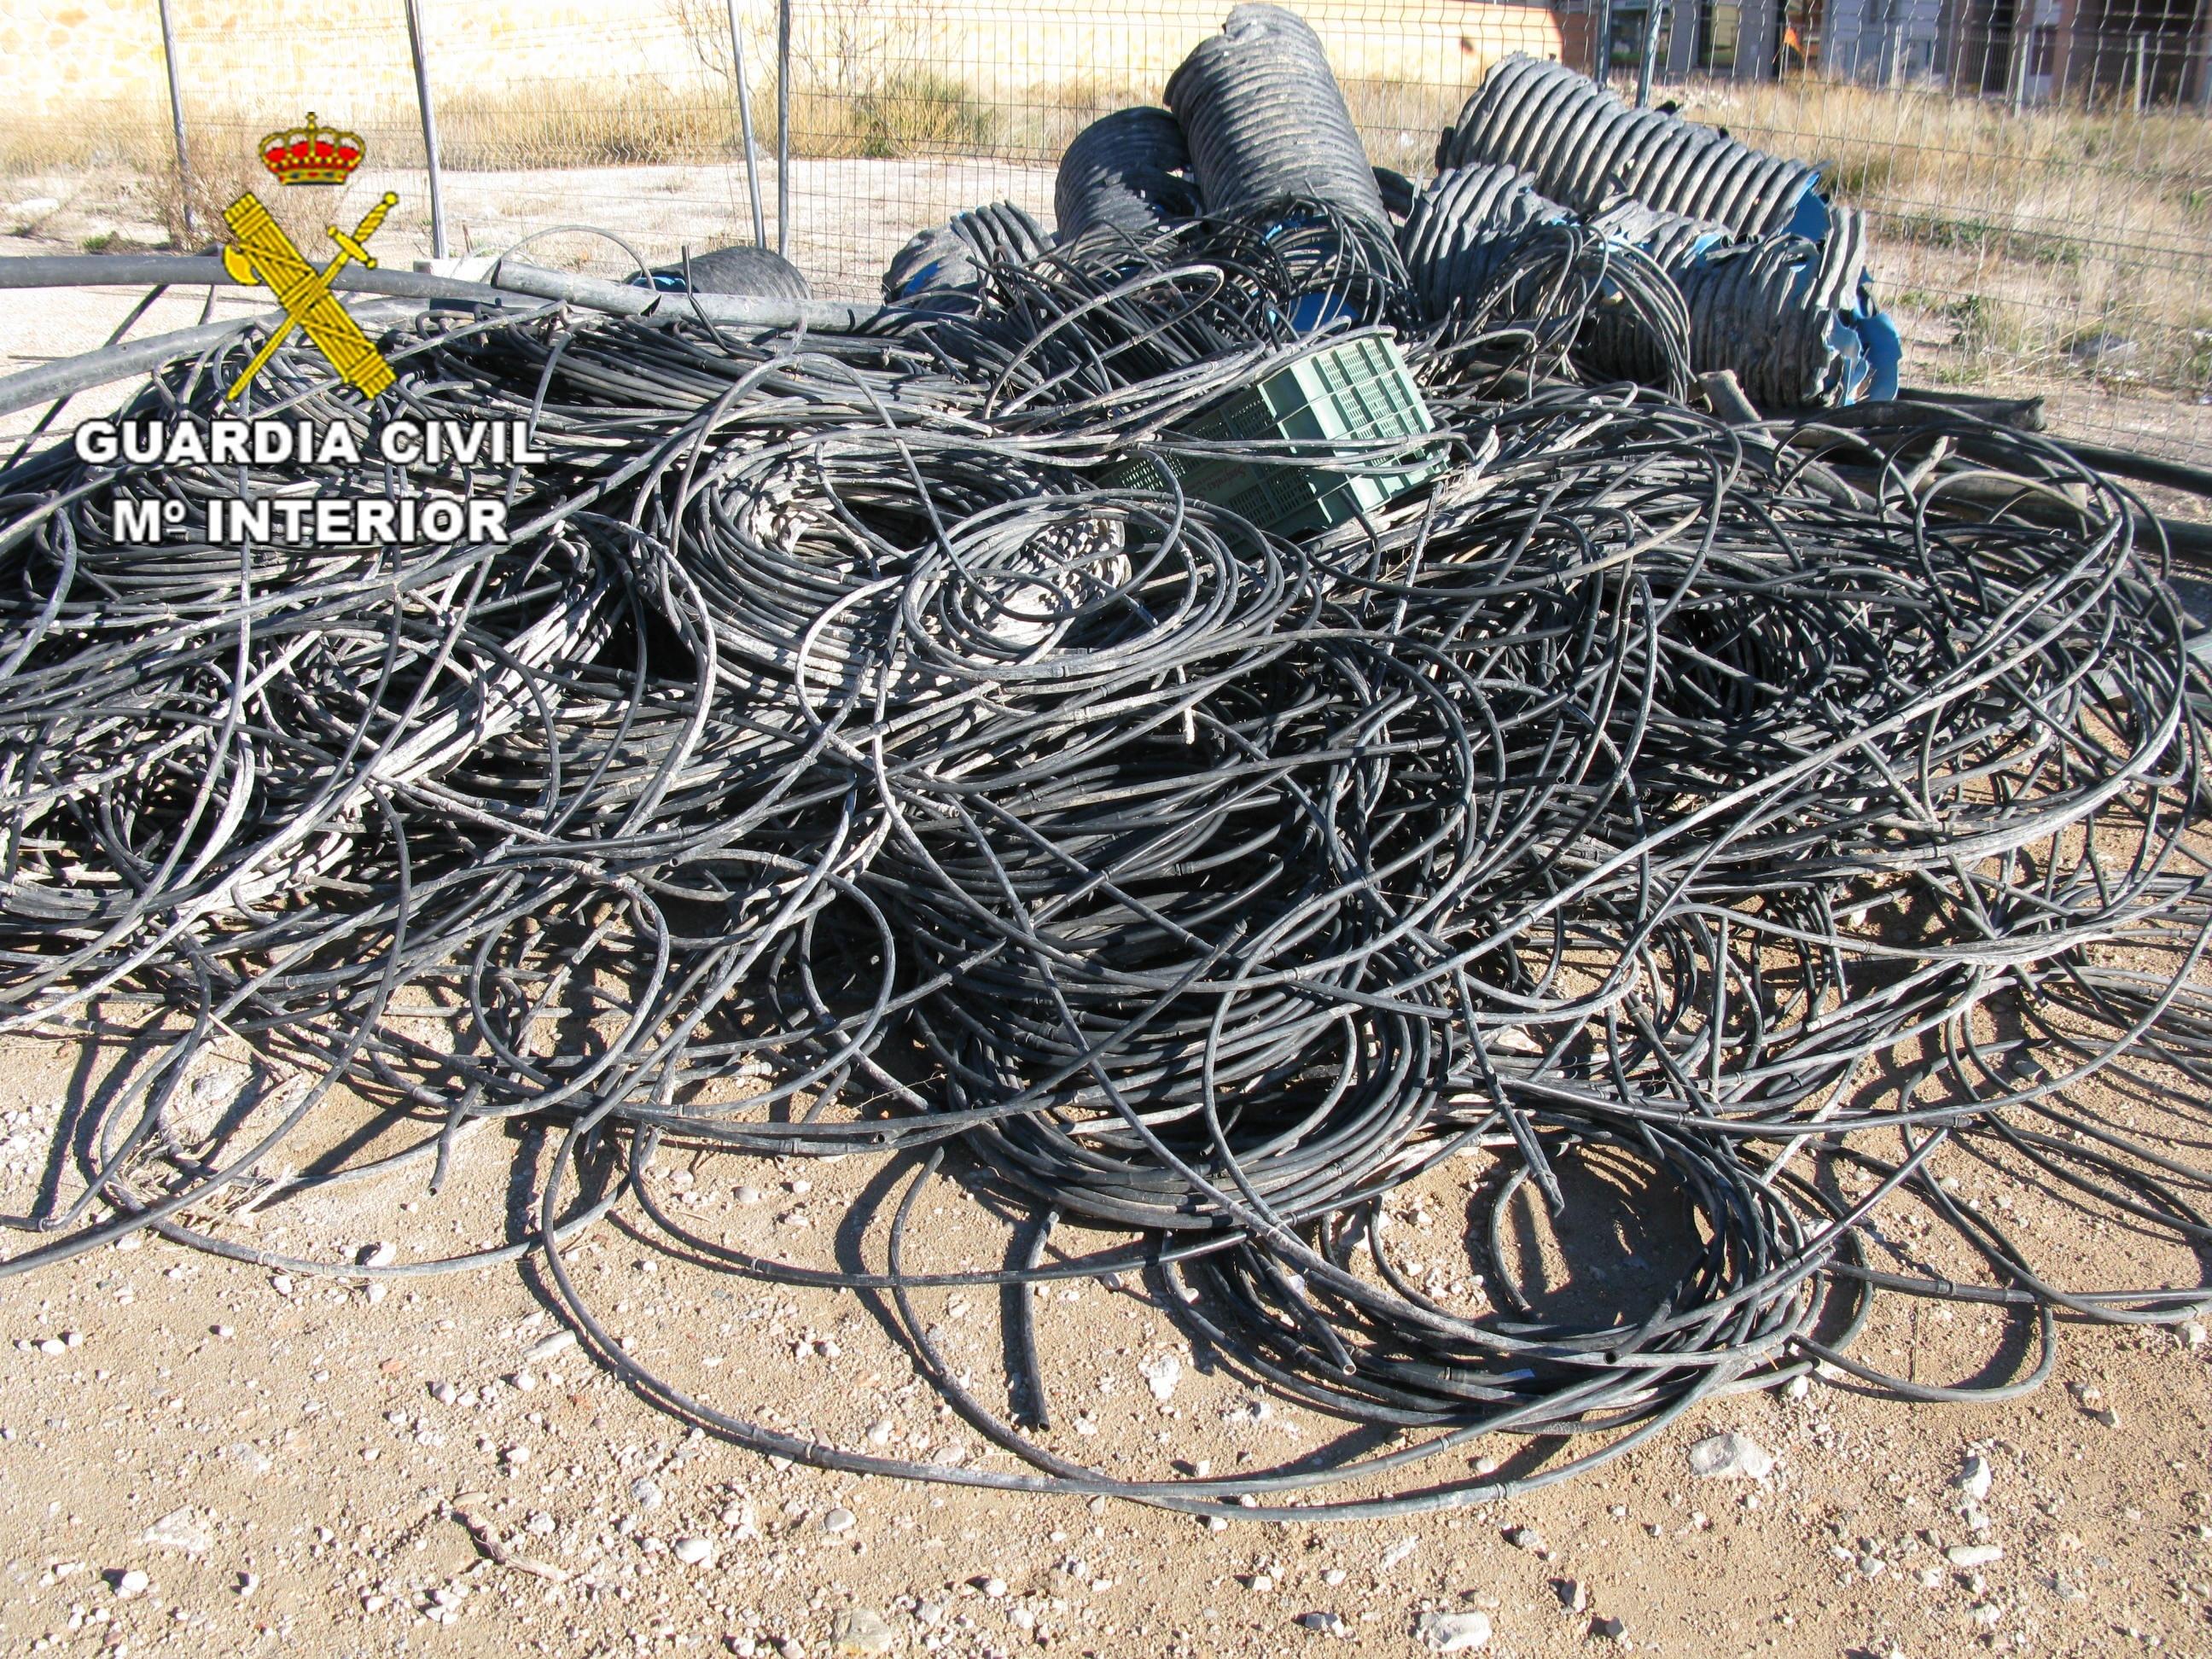 Detenidos en Albacete por sustraer 5 kilómetros de tubo de goma para regadío valorados en 750 euros